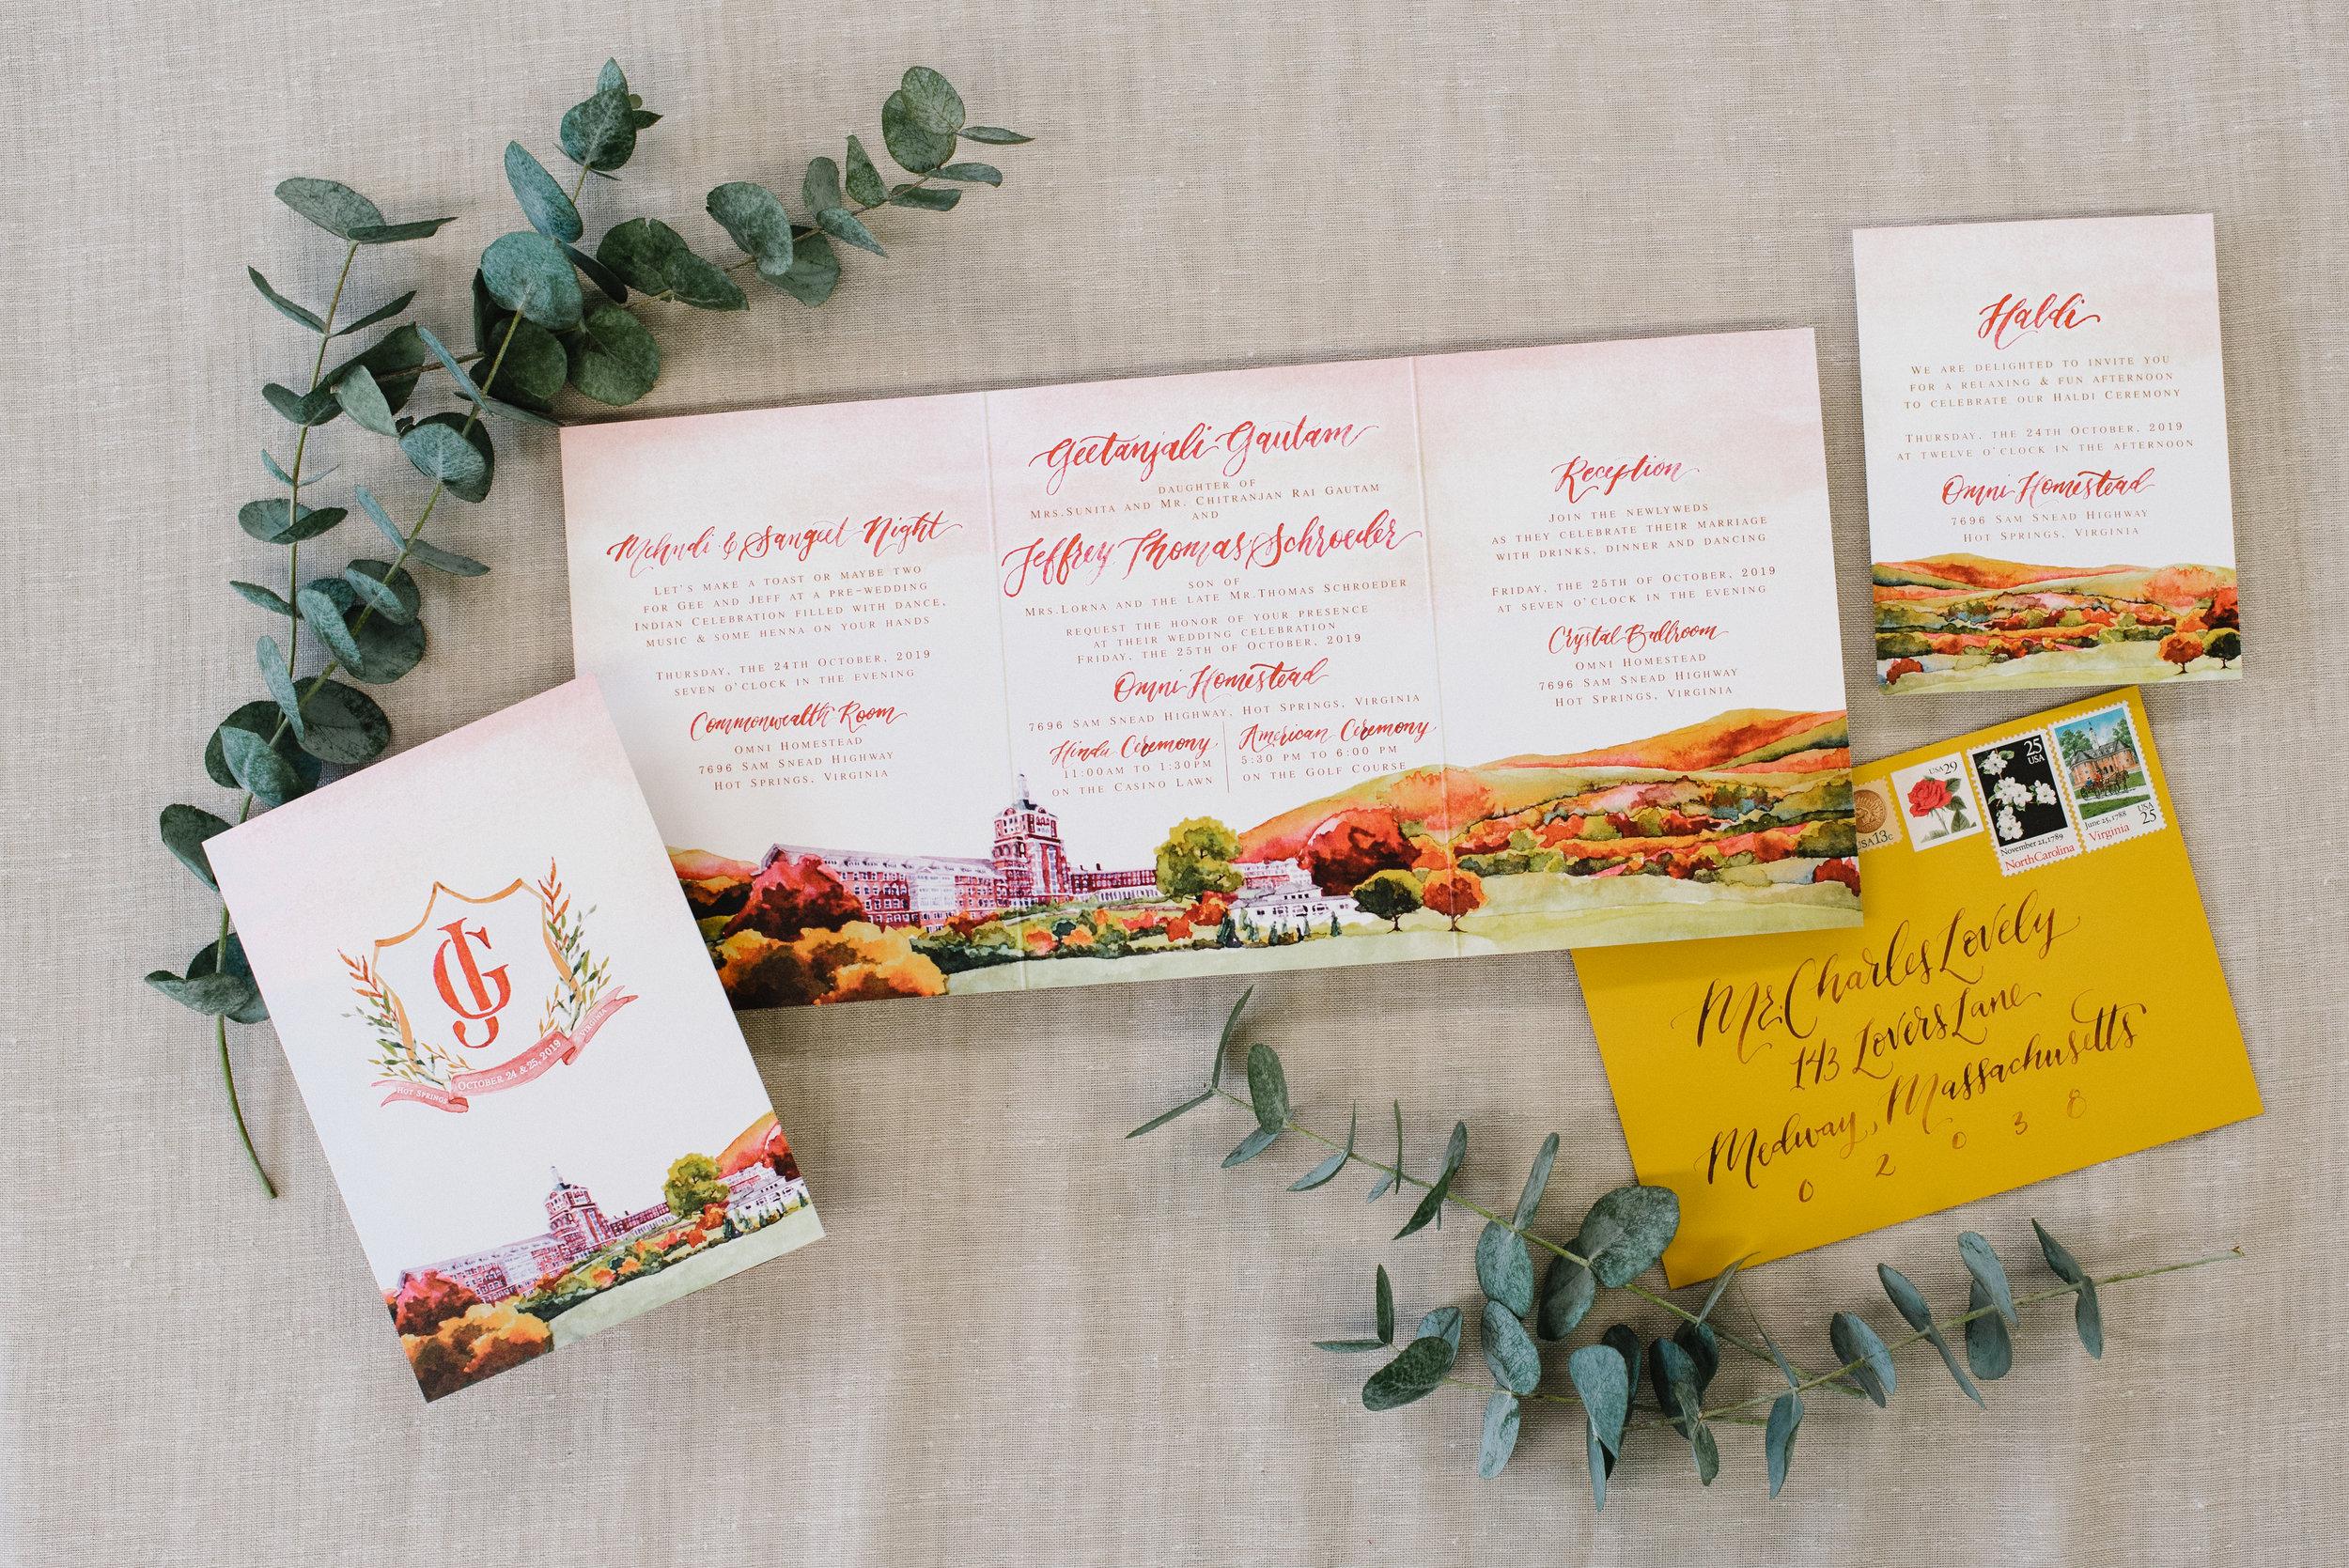 OMNI HOMESTEAD, HOT SPRINGS, VIRGINIA, WATERCOLOR WEDDING INVITATIONS